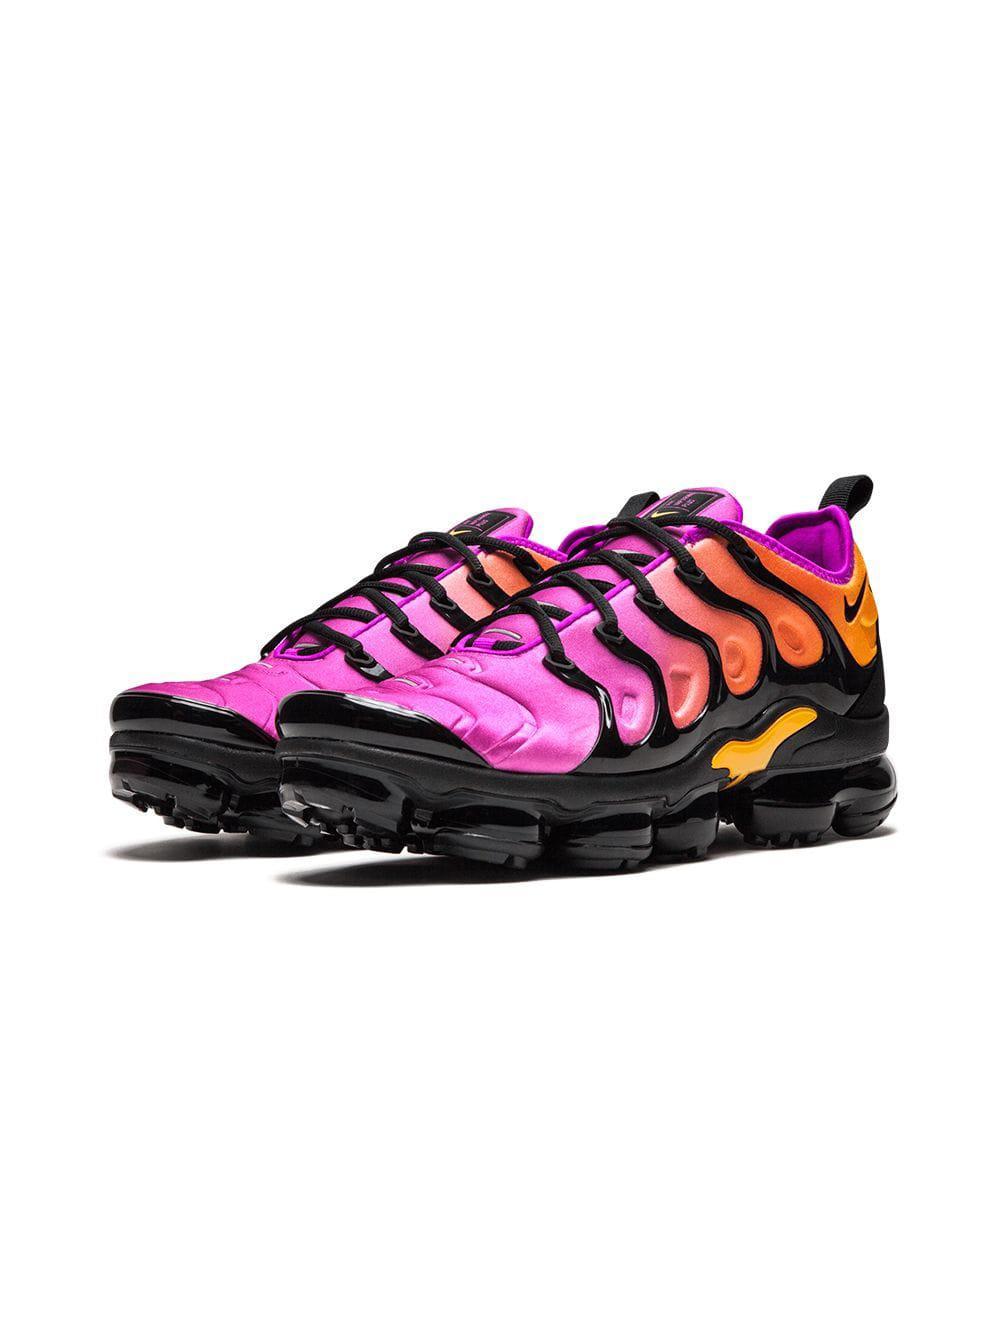 1ac15bab92 Nike Air Vapormax Plus Sneakers in Black - Lyst